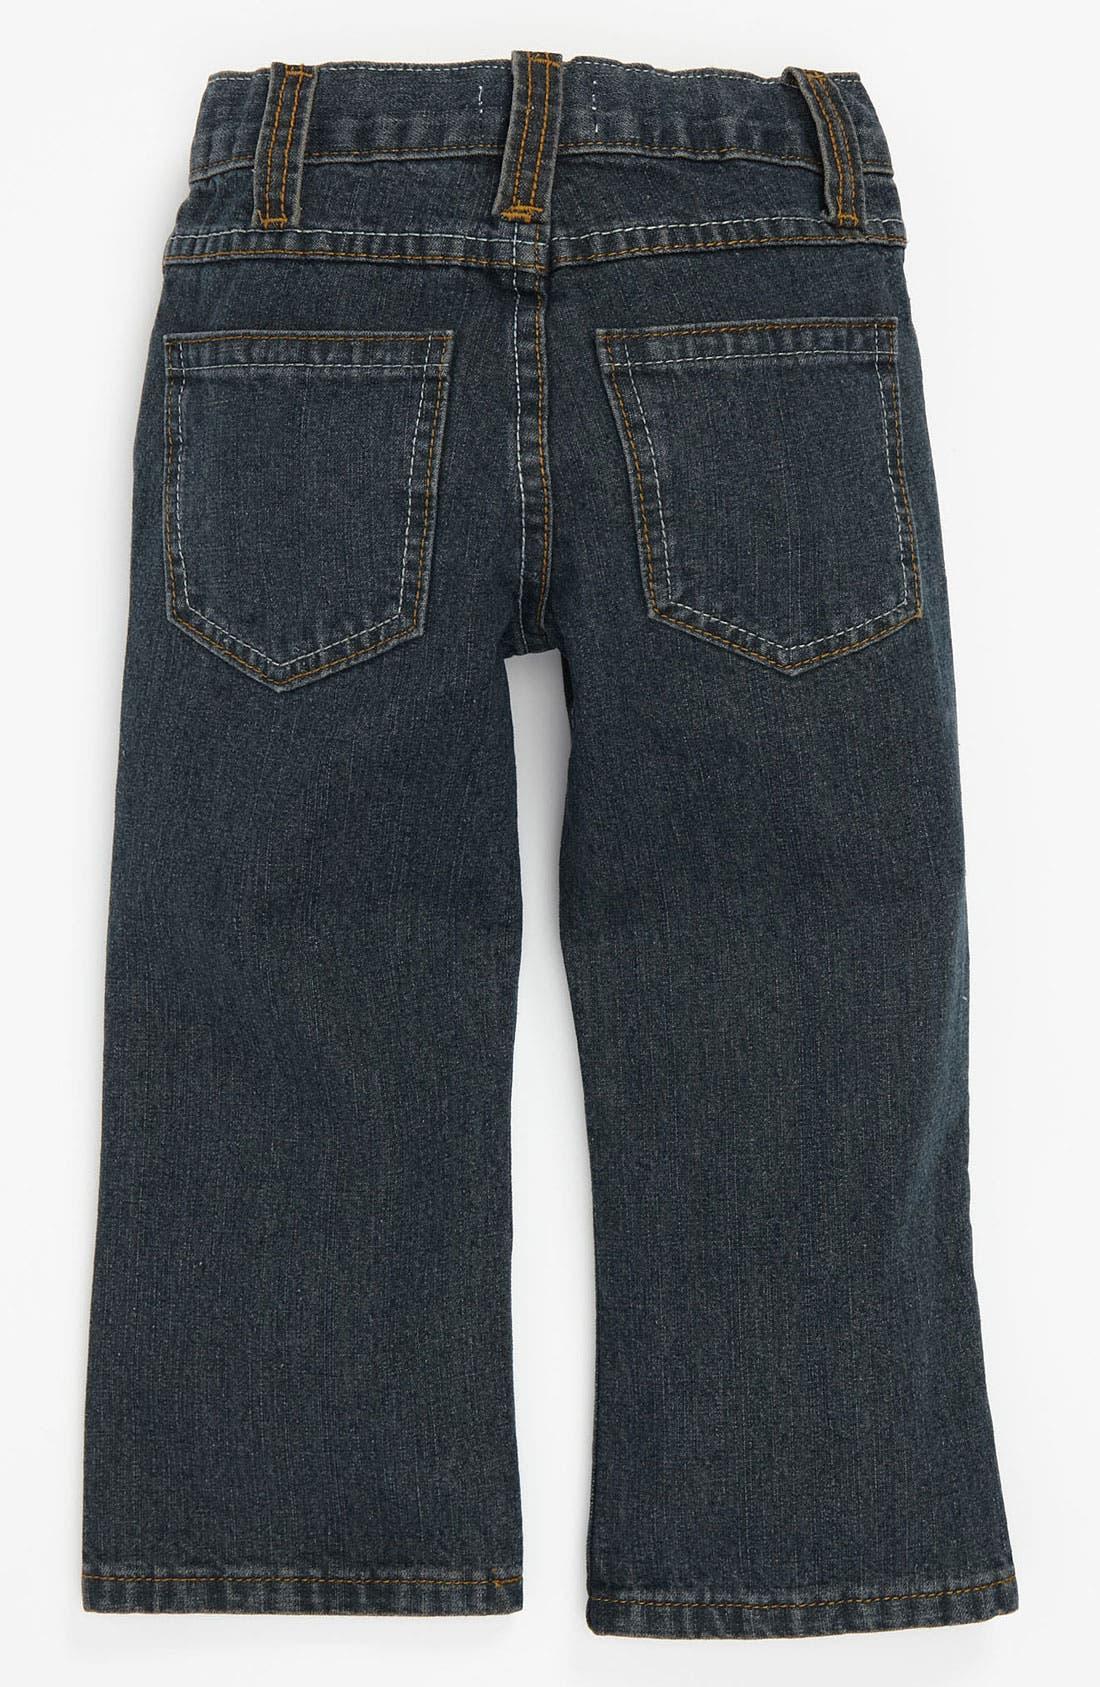 Alternate Image 1 Selected - Pumpkin Patch Regular Fit Jeans (Toddler)